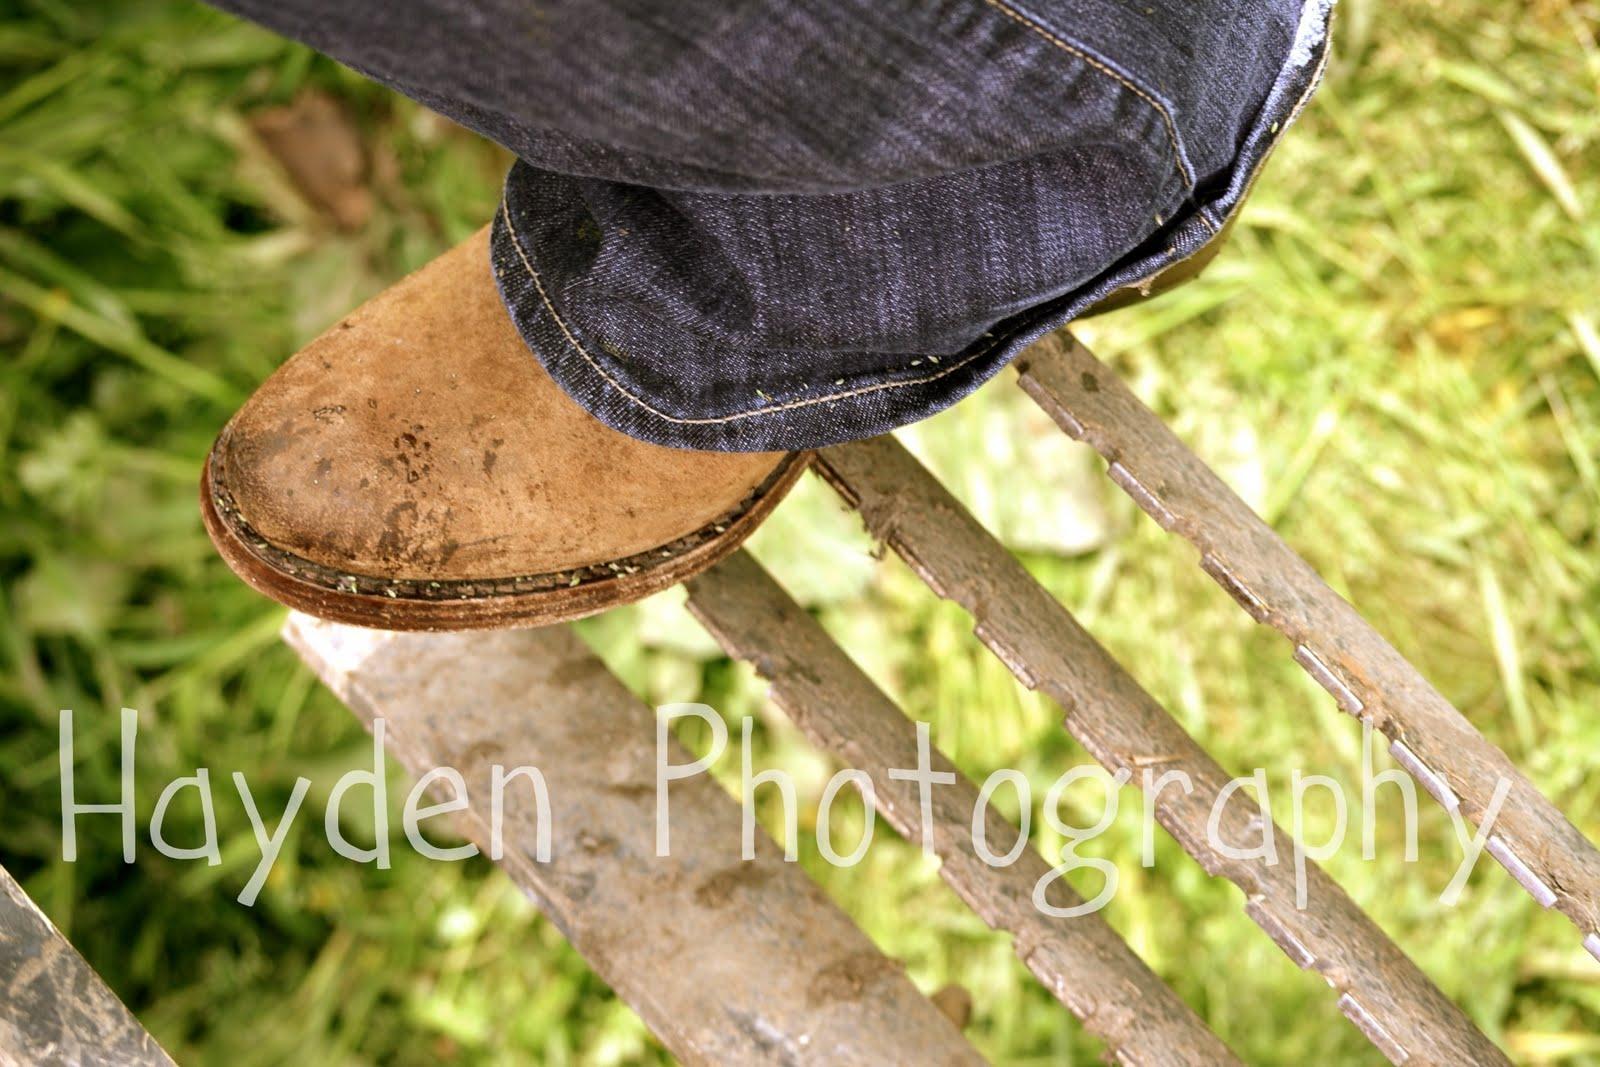 Hayden Photography